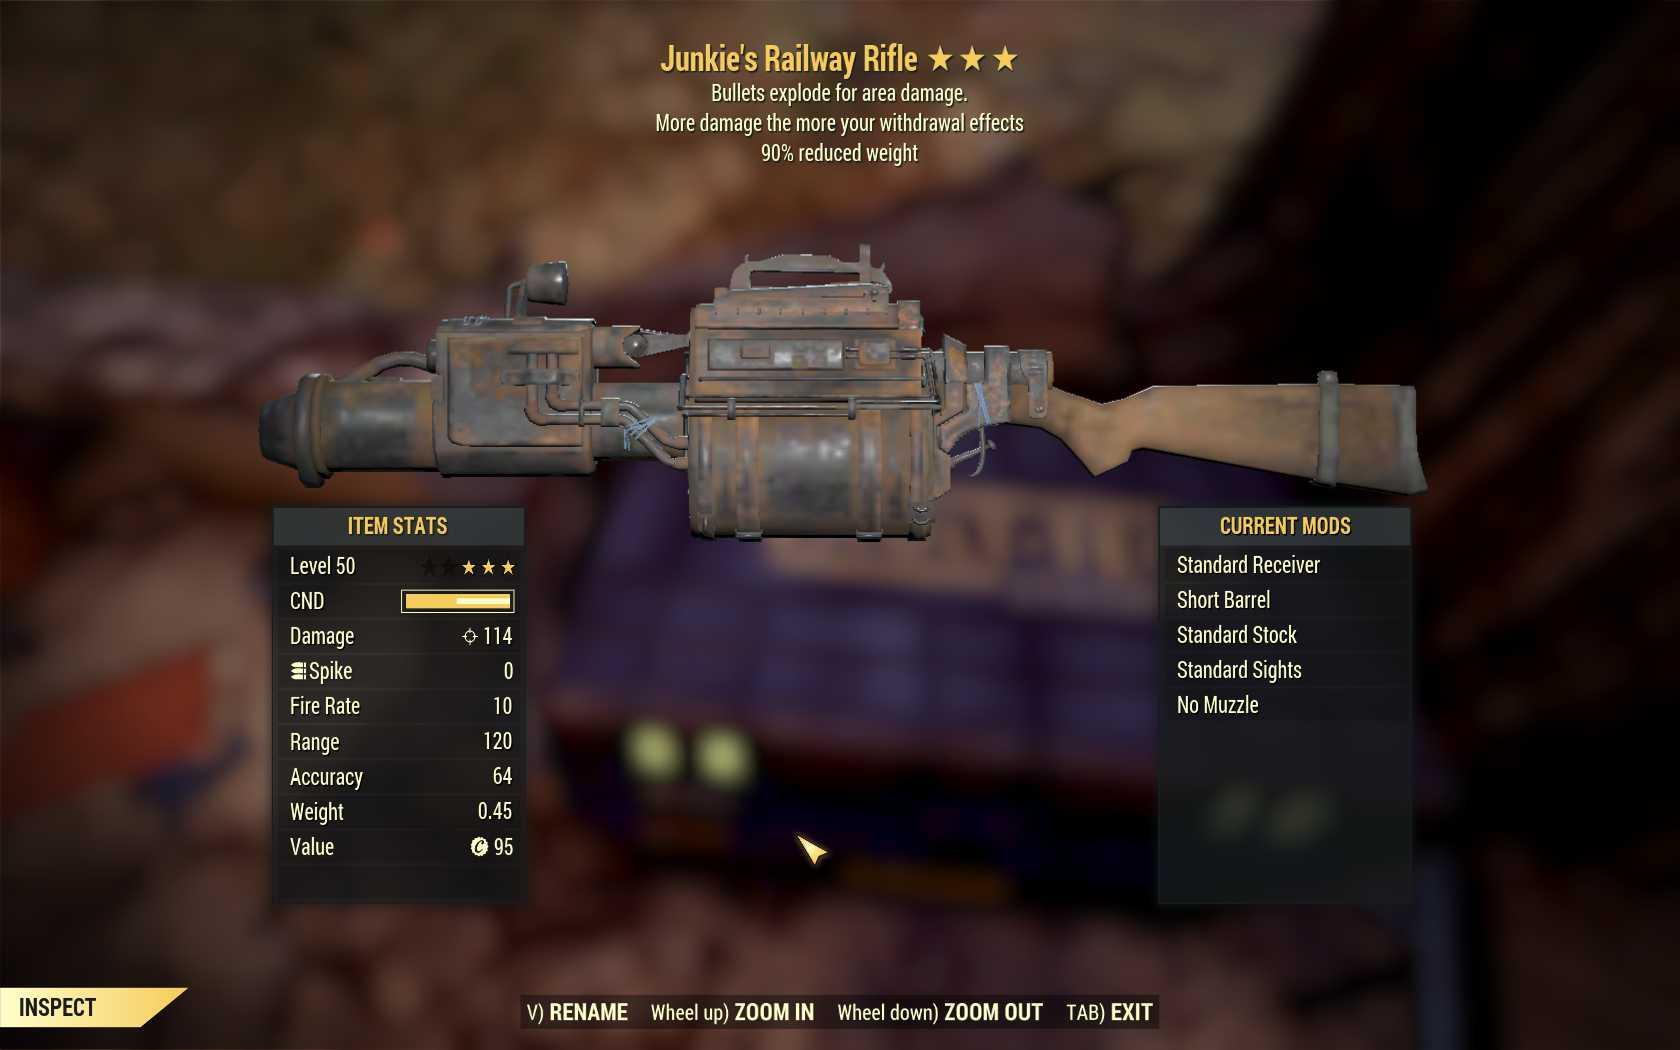 [3 Stars]Junkie's+Explosive Railway+90% reduced weight